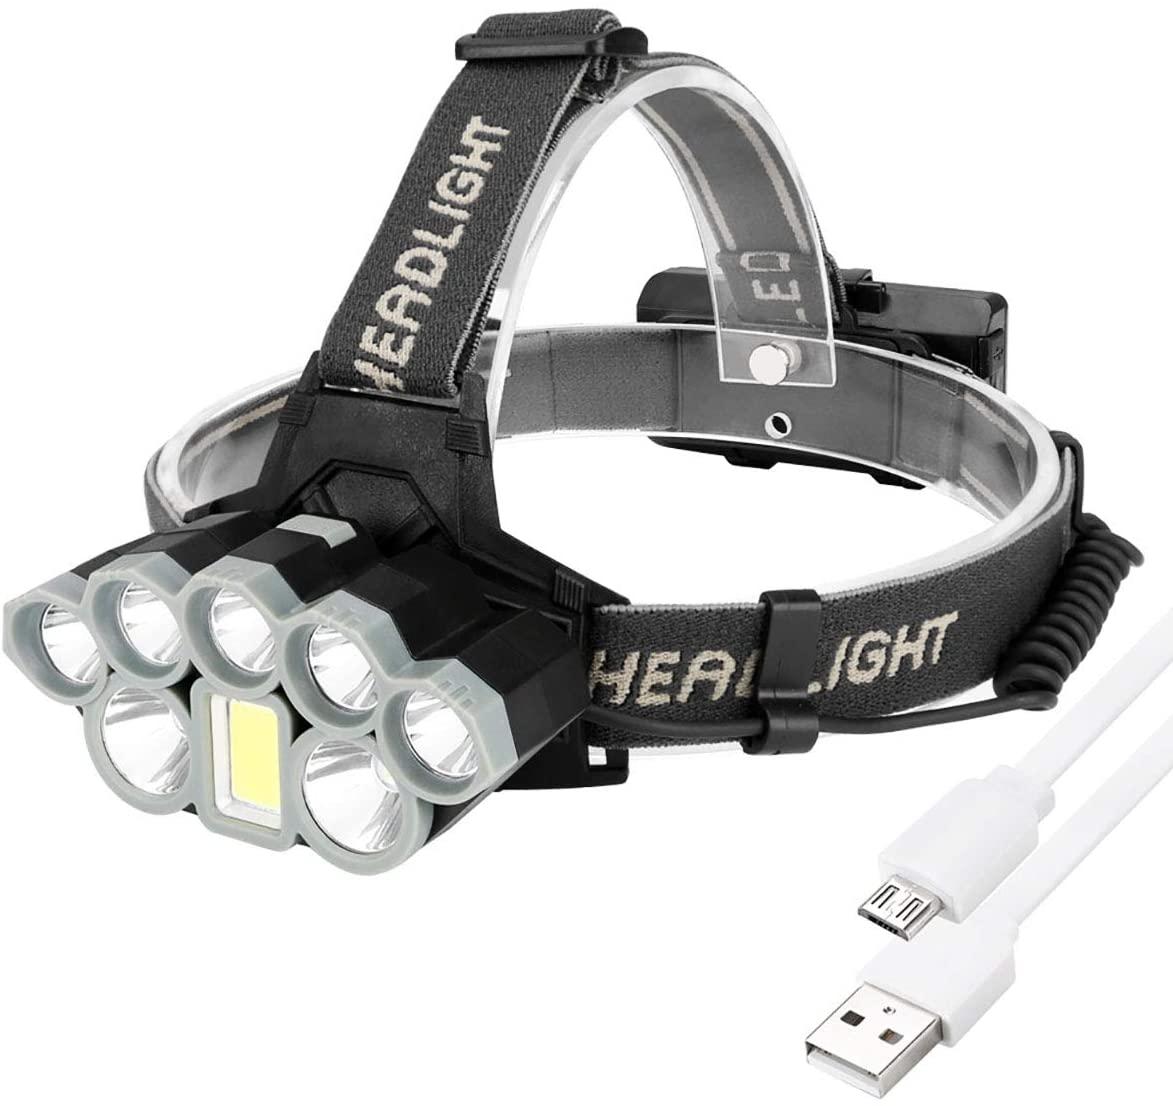 LED Headlights, 6 Lighting Modes Glare Sensor Rechargeable Remote Super Bright Head-Mounted Flashlight Fishing Night Fishing Lights